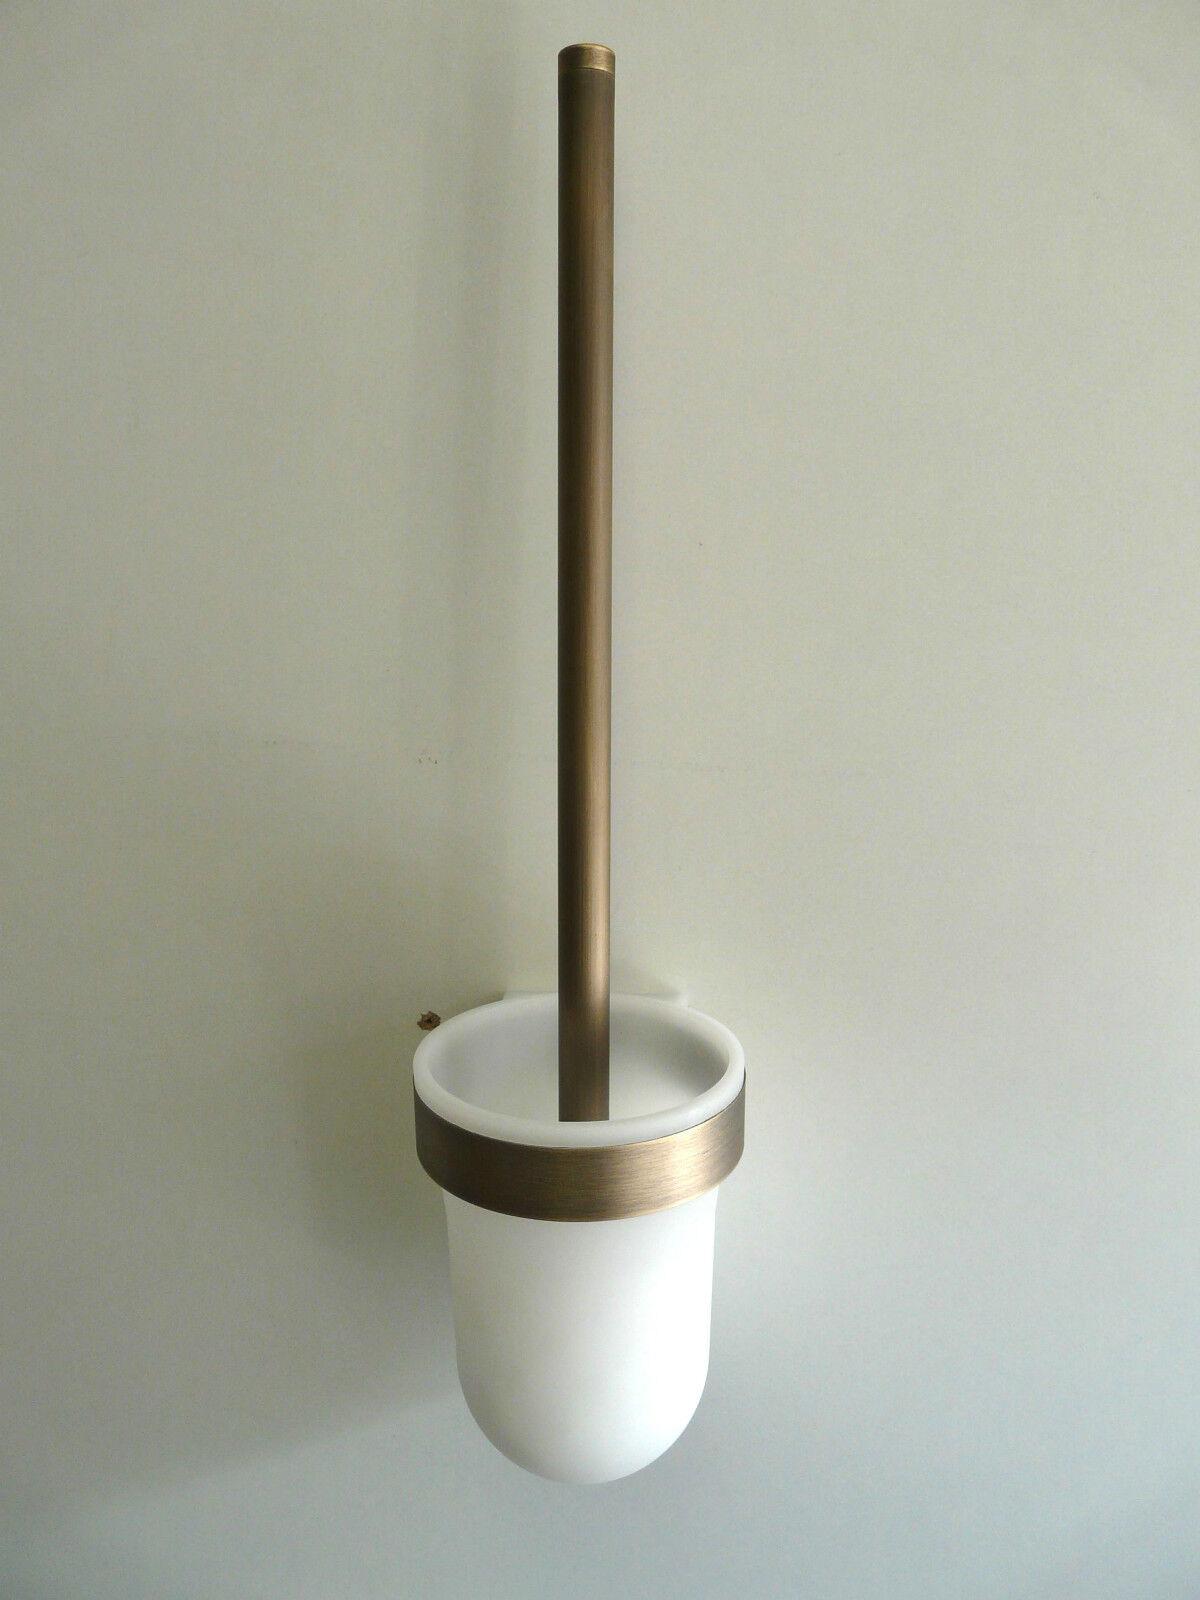 Porte-Balai Keuco City2 Bronze, Ensemble Brosse pour Wc, de Toilette,